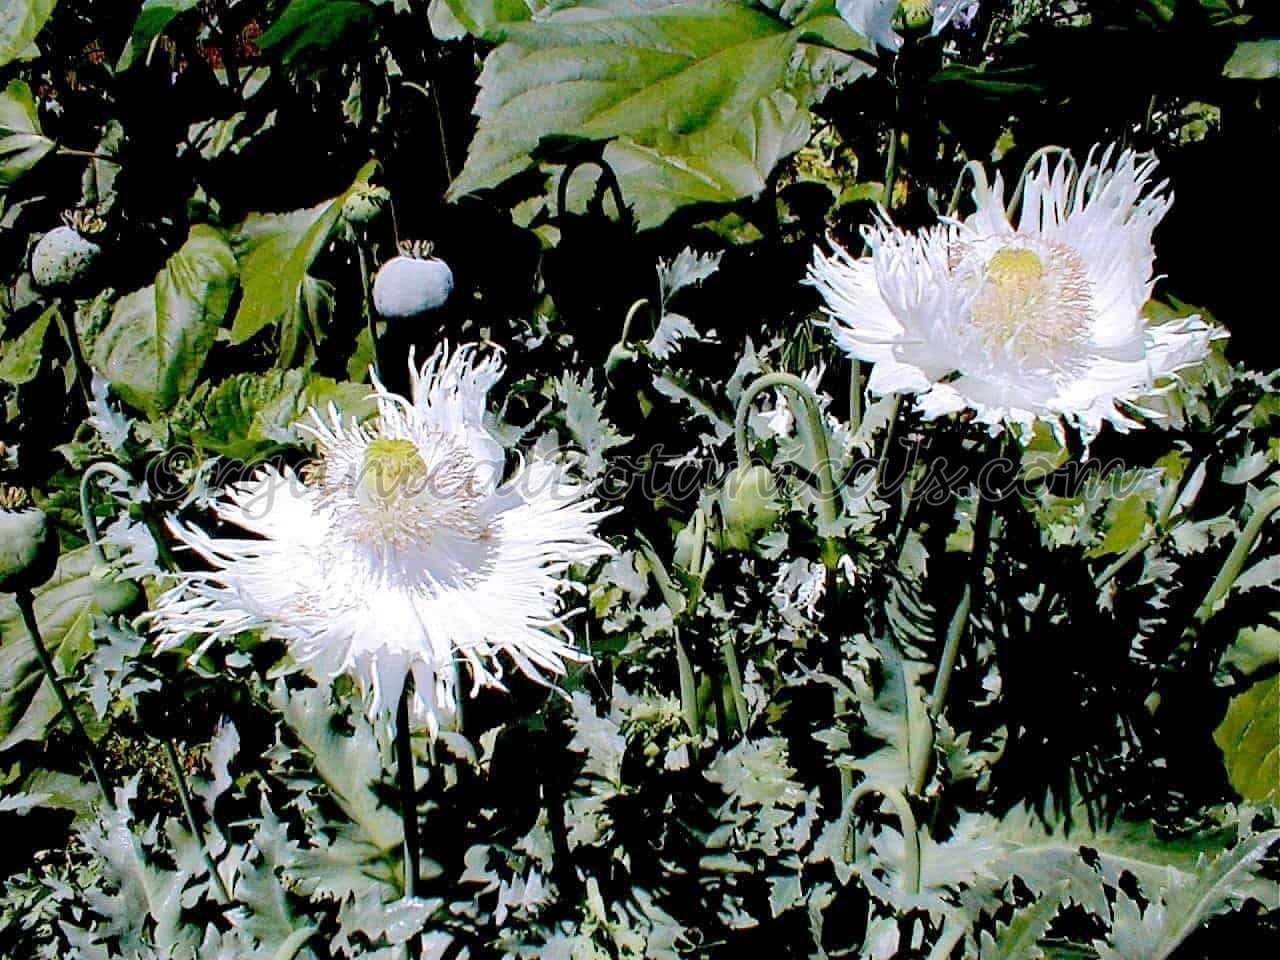 Heirloom White Somniferum Poppy Flowers